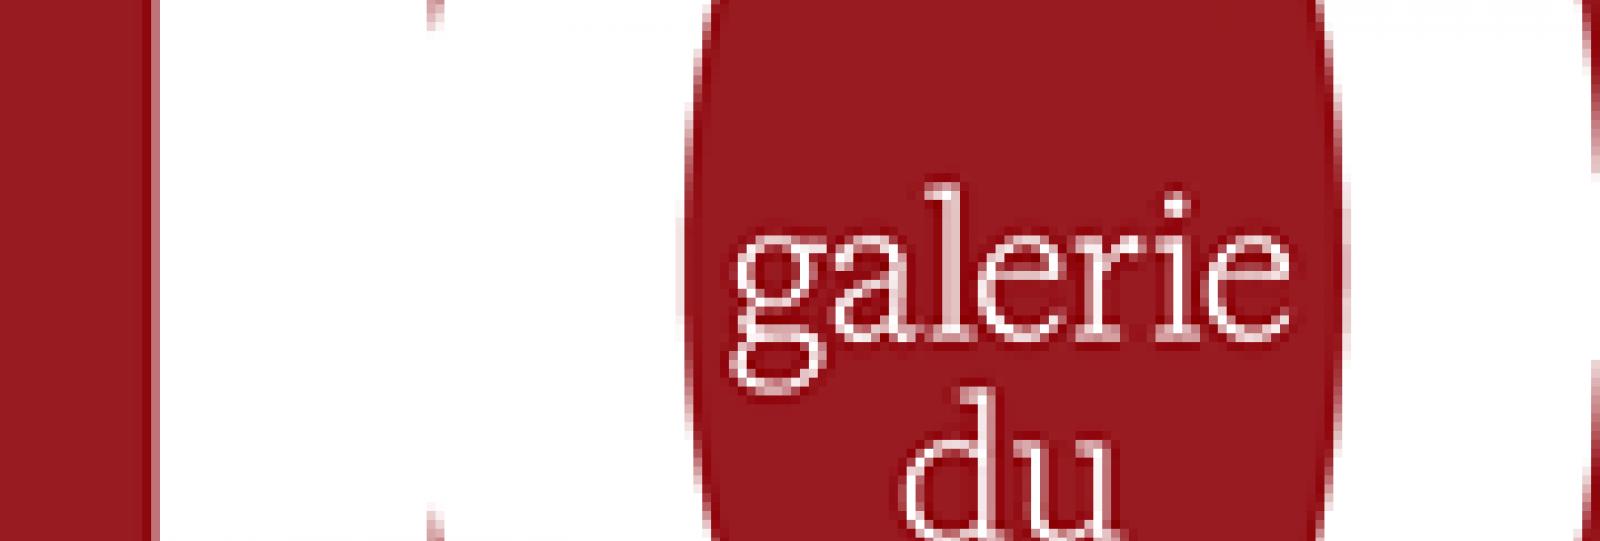 Galerie du 10